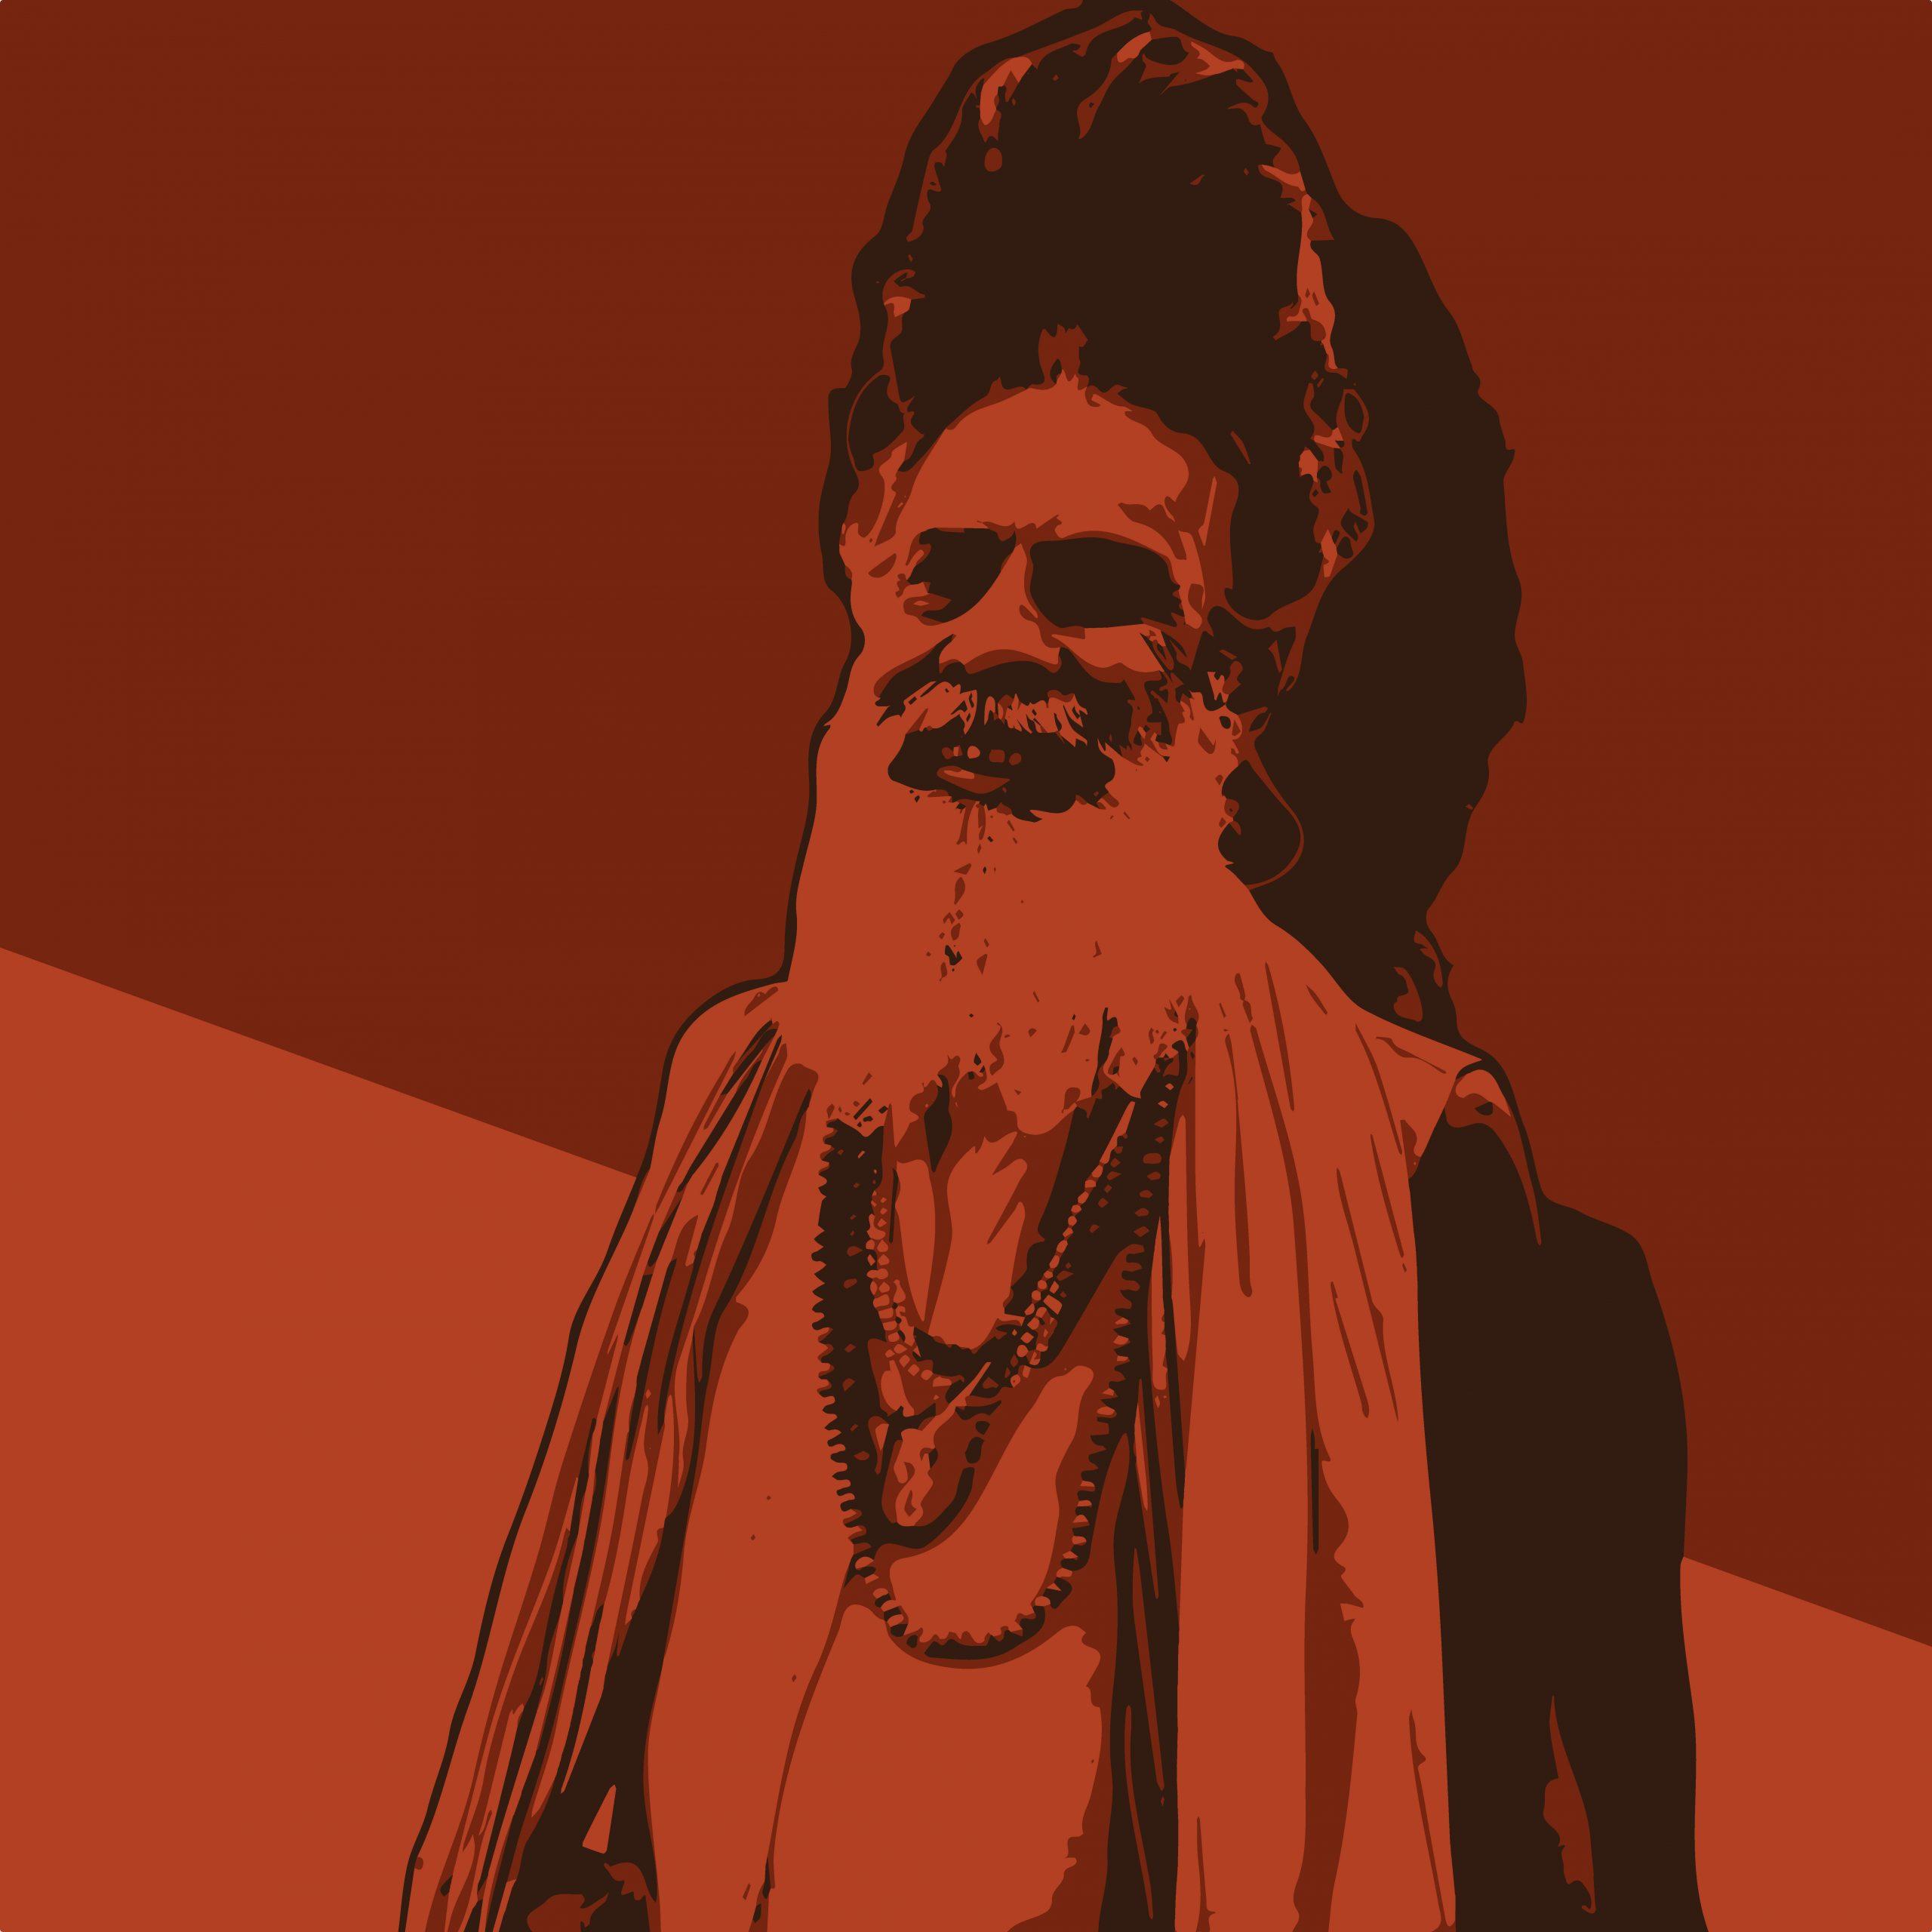 Illustration of a monk